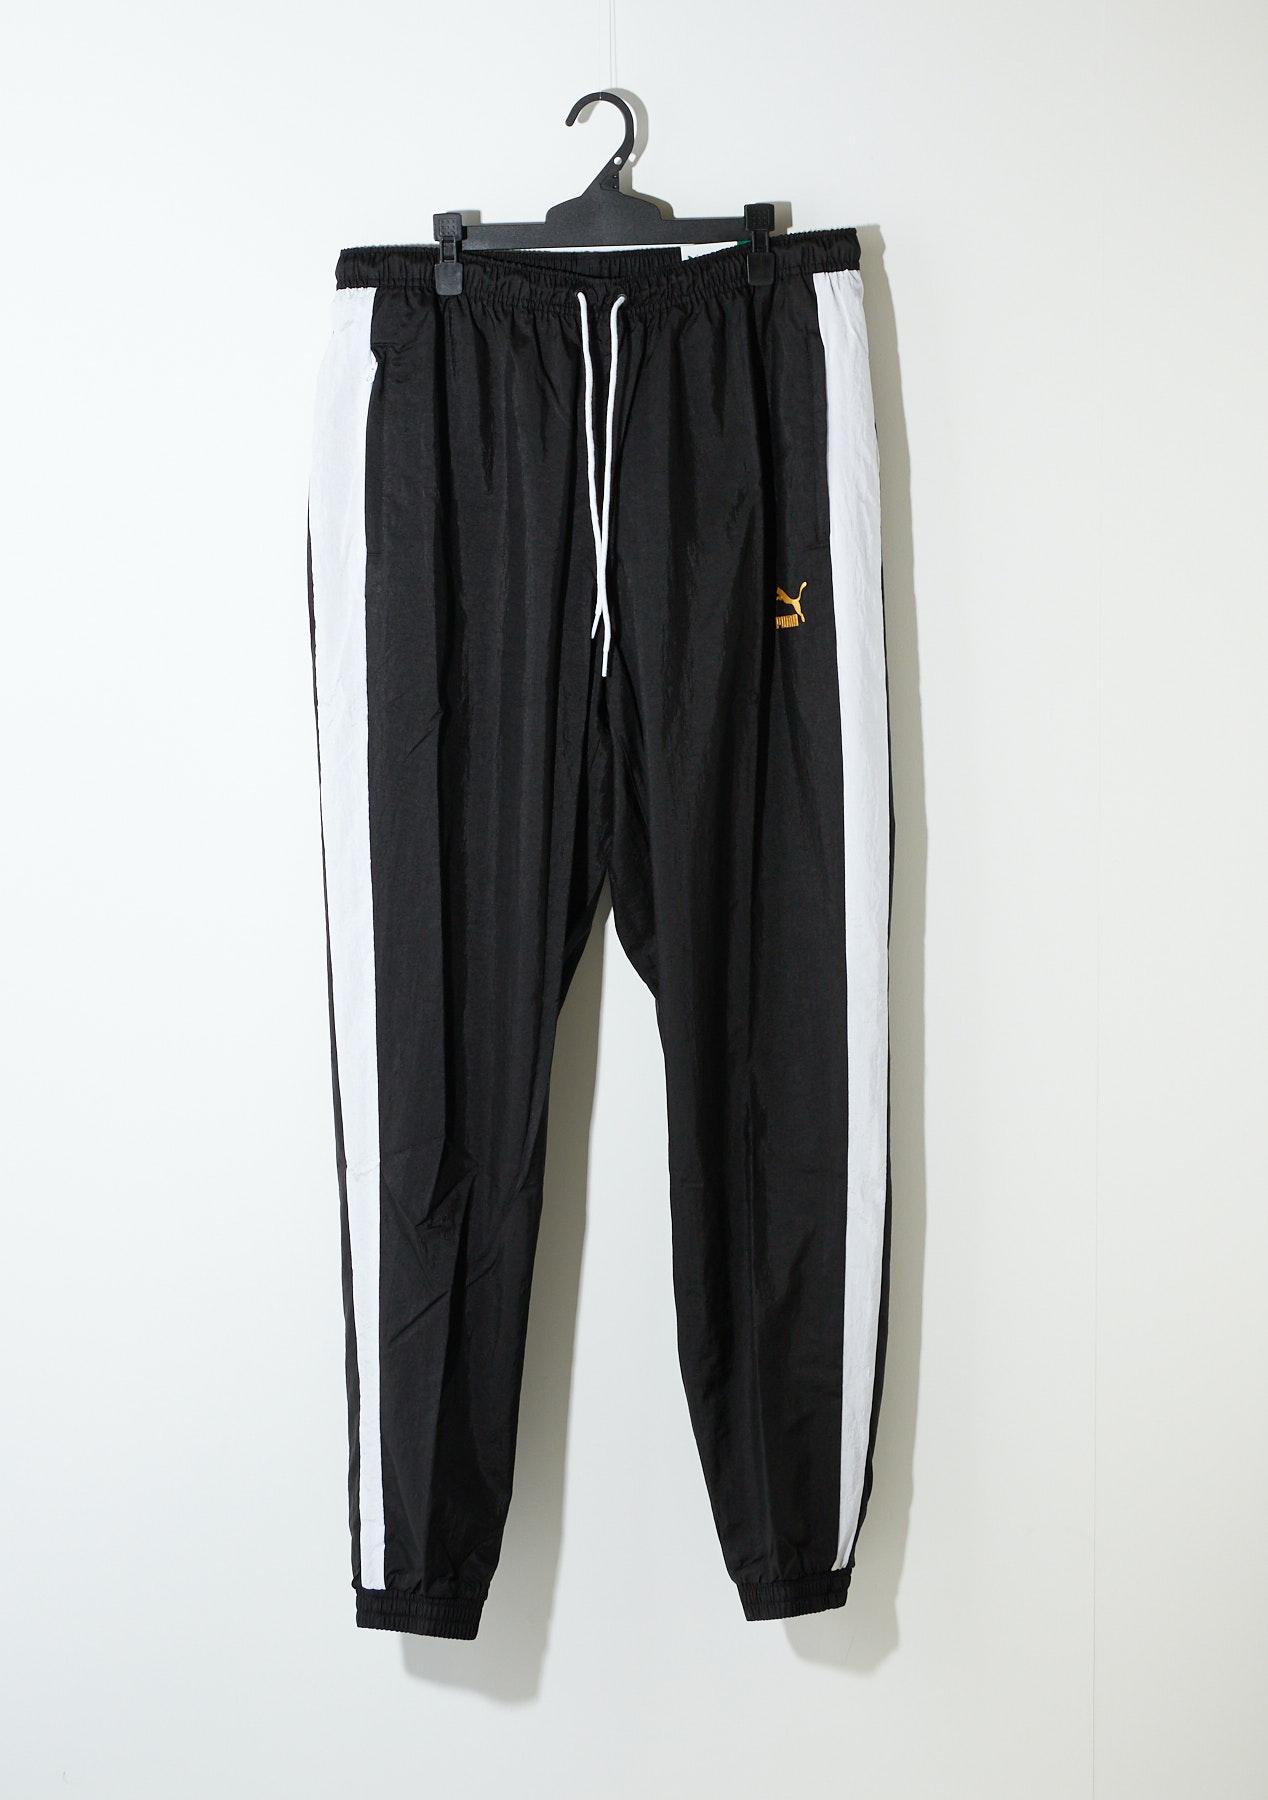 Perceptible Confidencial Al frente  Puma - T7 Bboy Track Pants - Black-White - Mens Essentials - Onceit